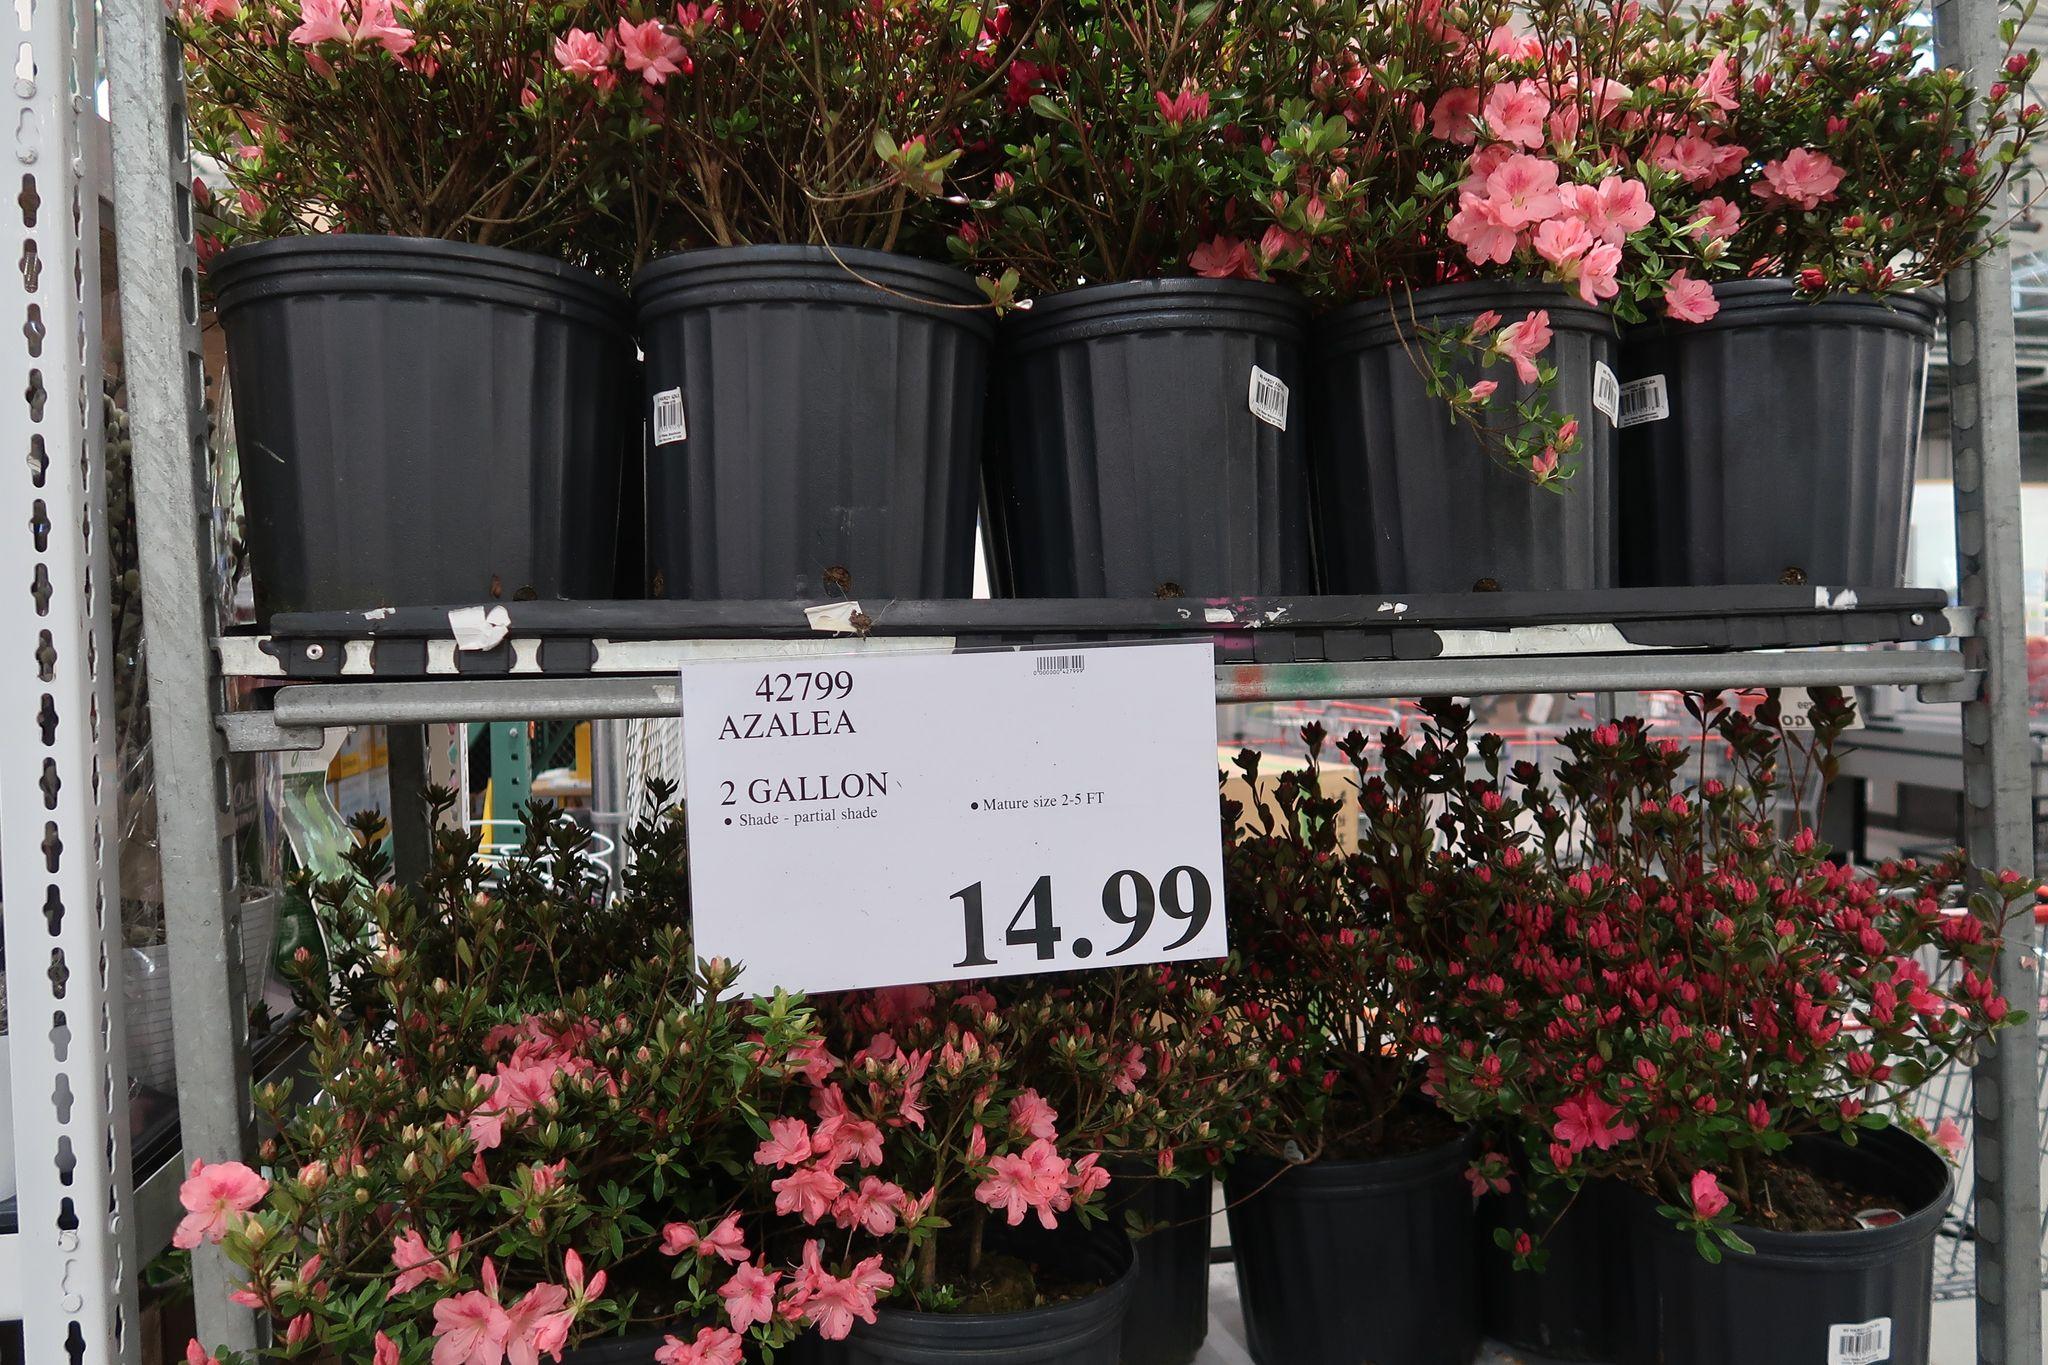 Azalea 2 Gallon Planters $14.99